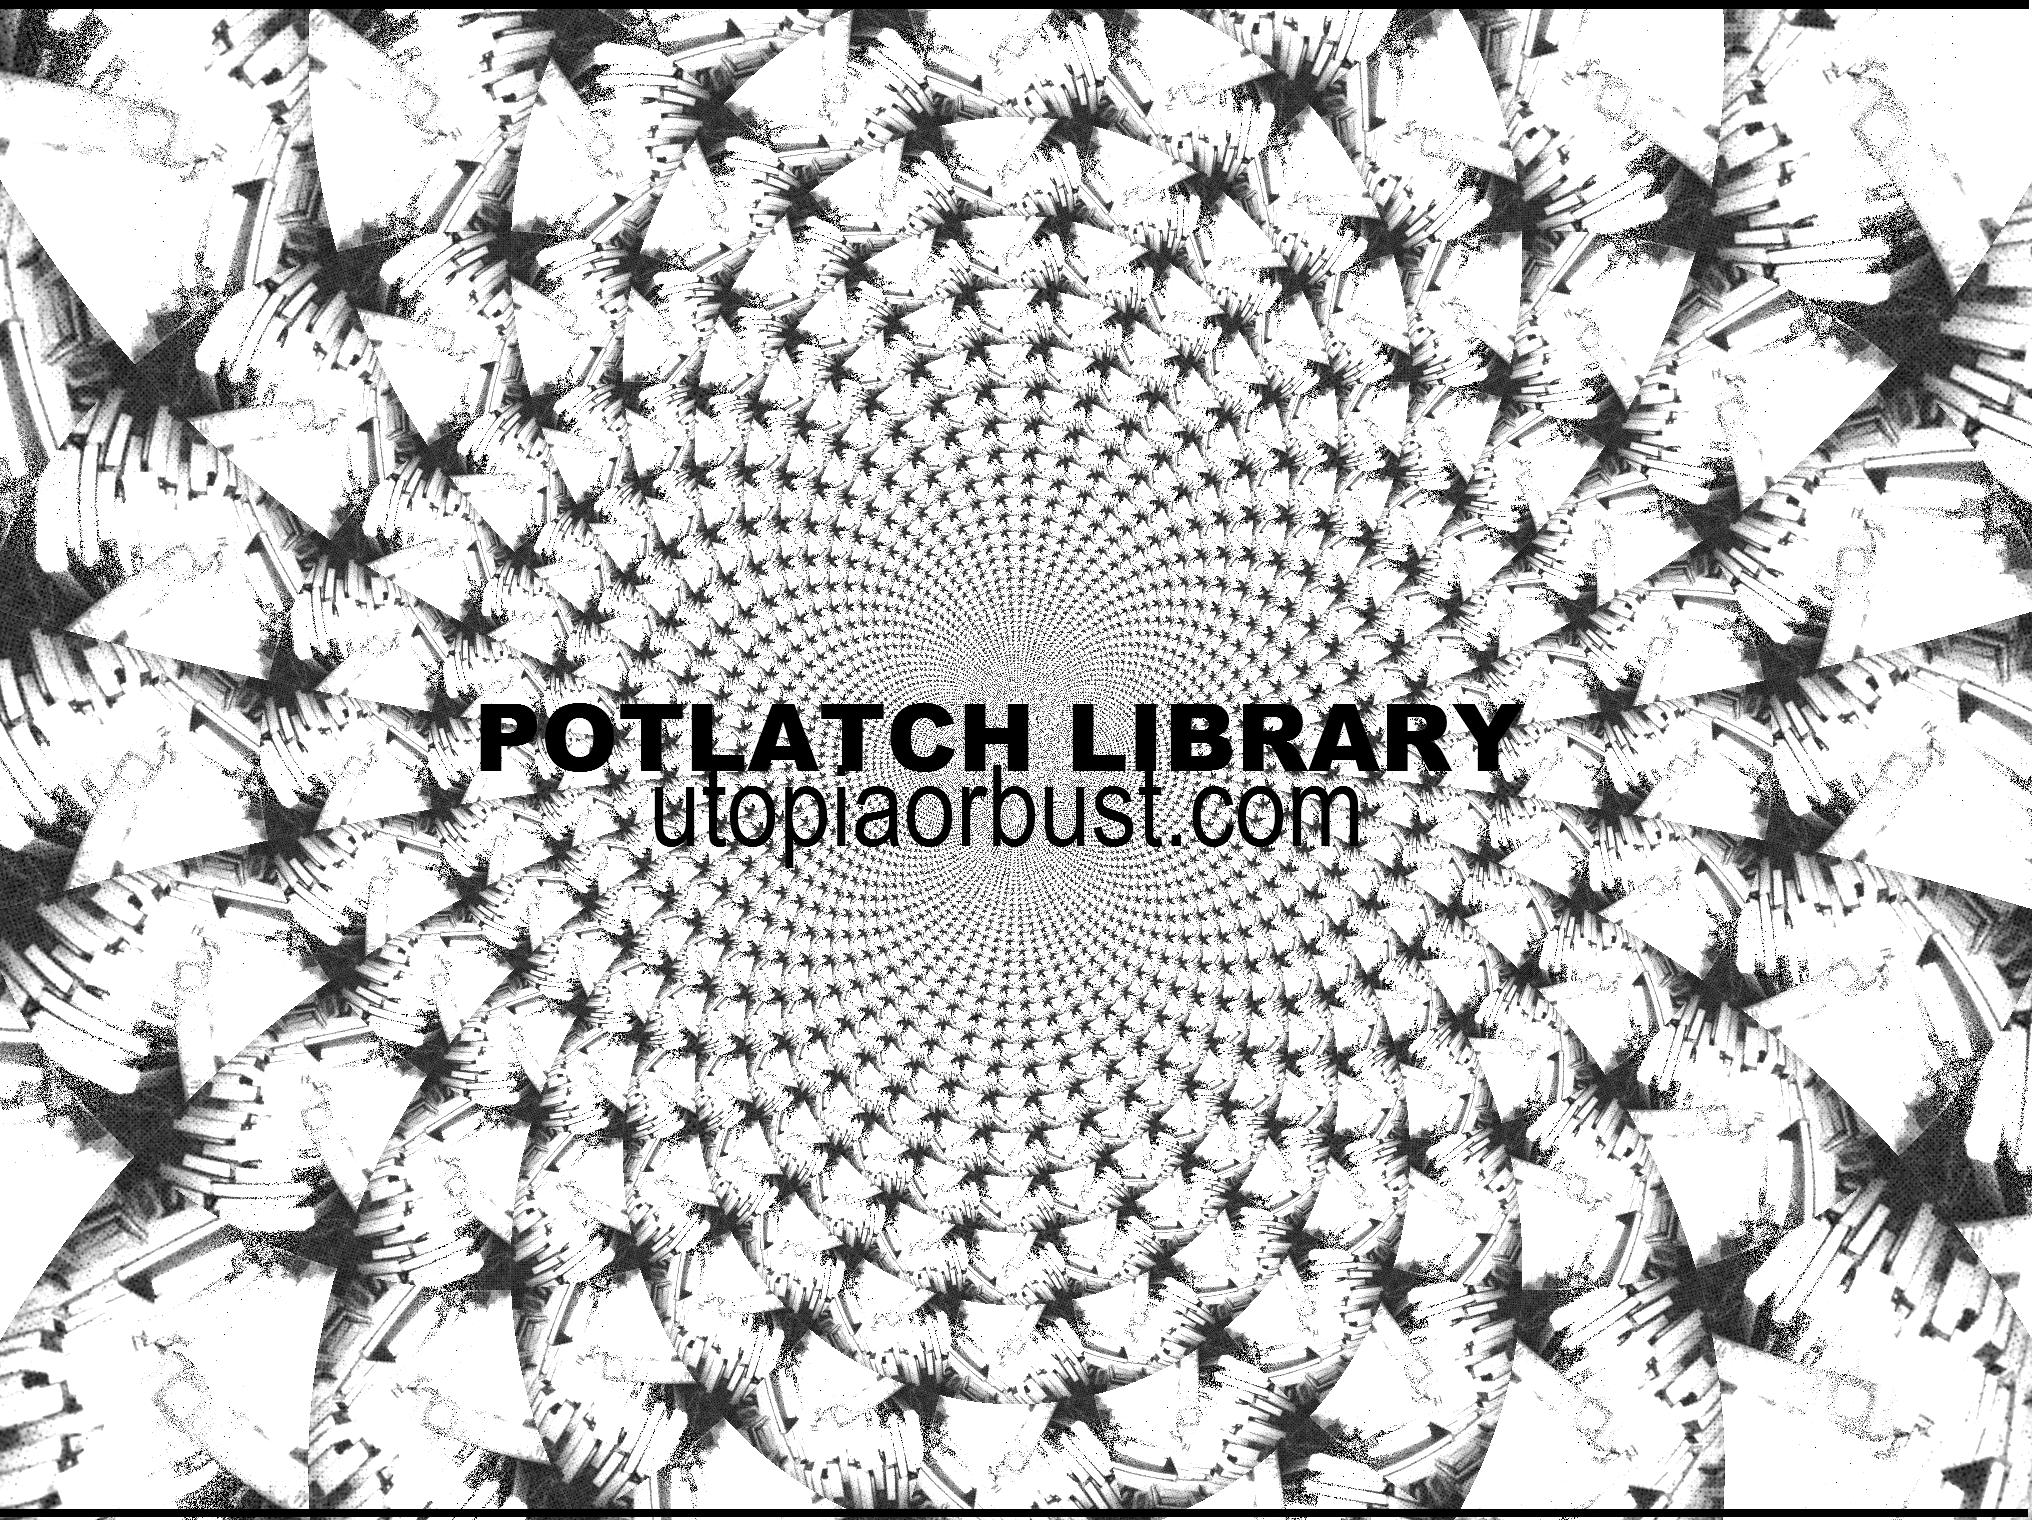 POTLATCH LIBRARY